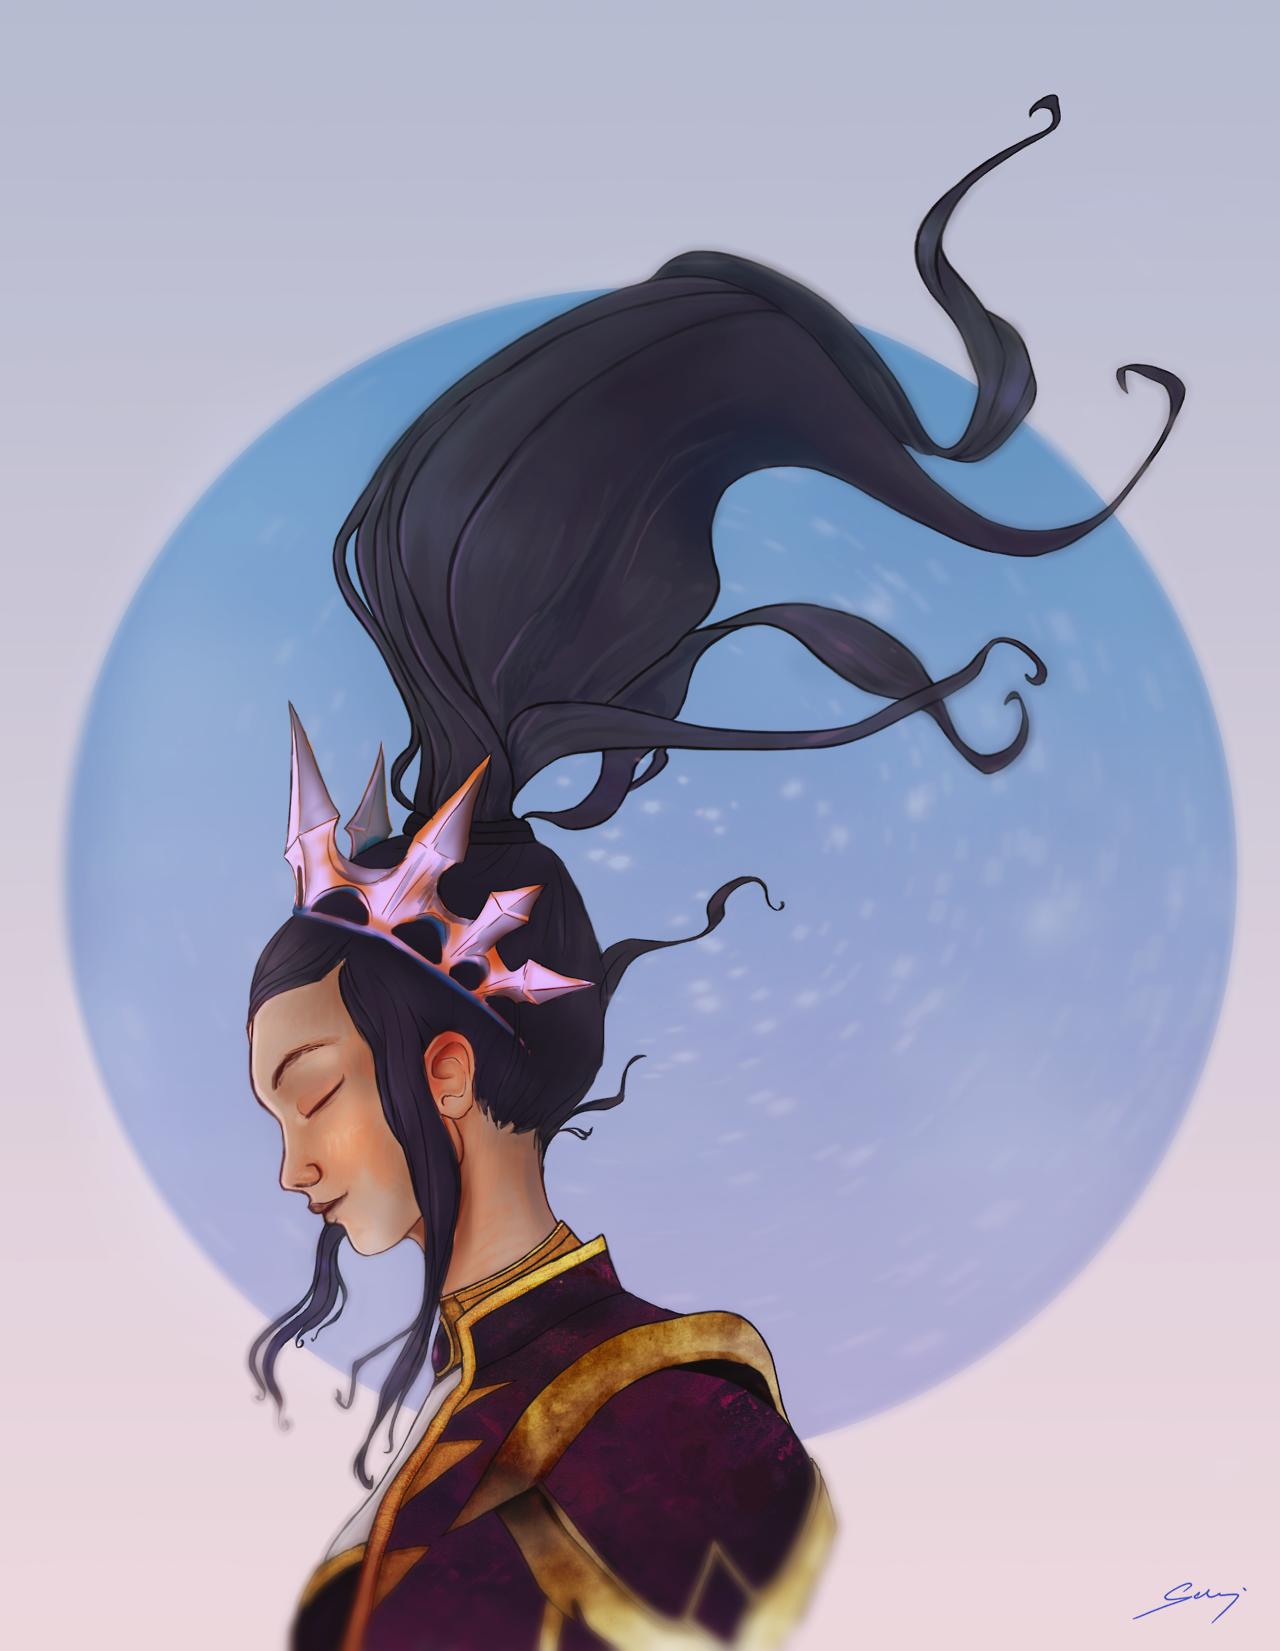 Pvaia Art Li Ming Diablo Fanart Heroes Of The Storm Hots Portrait Girl Black Hair Blizzard Inspiration Golden Aesthetics Art Fan Art My Arts